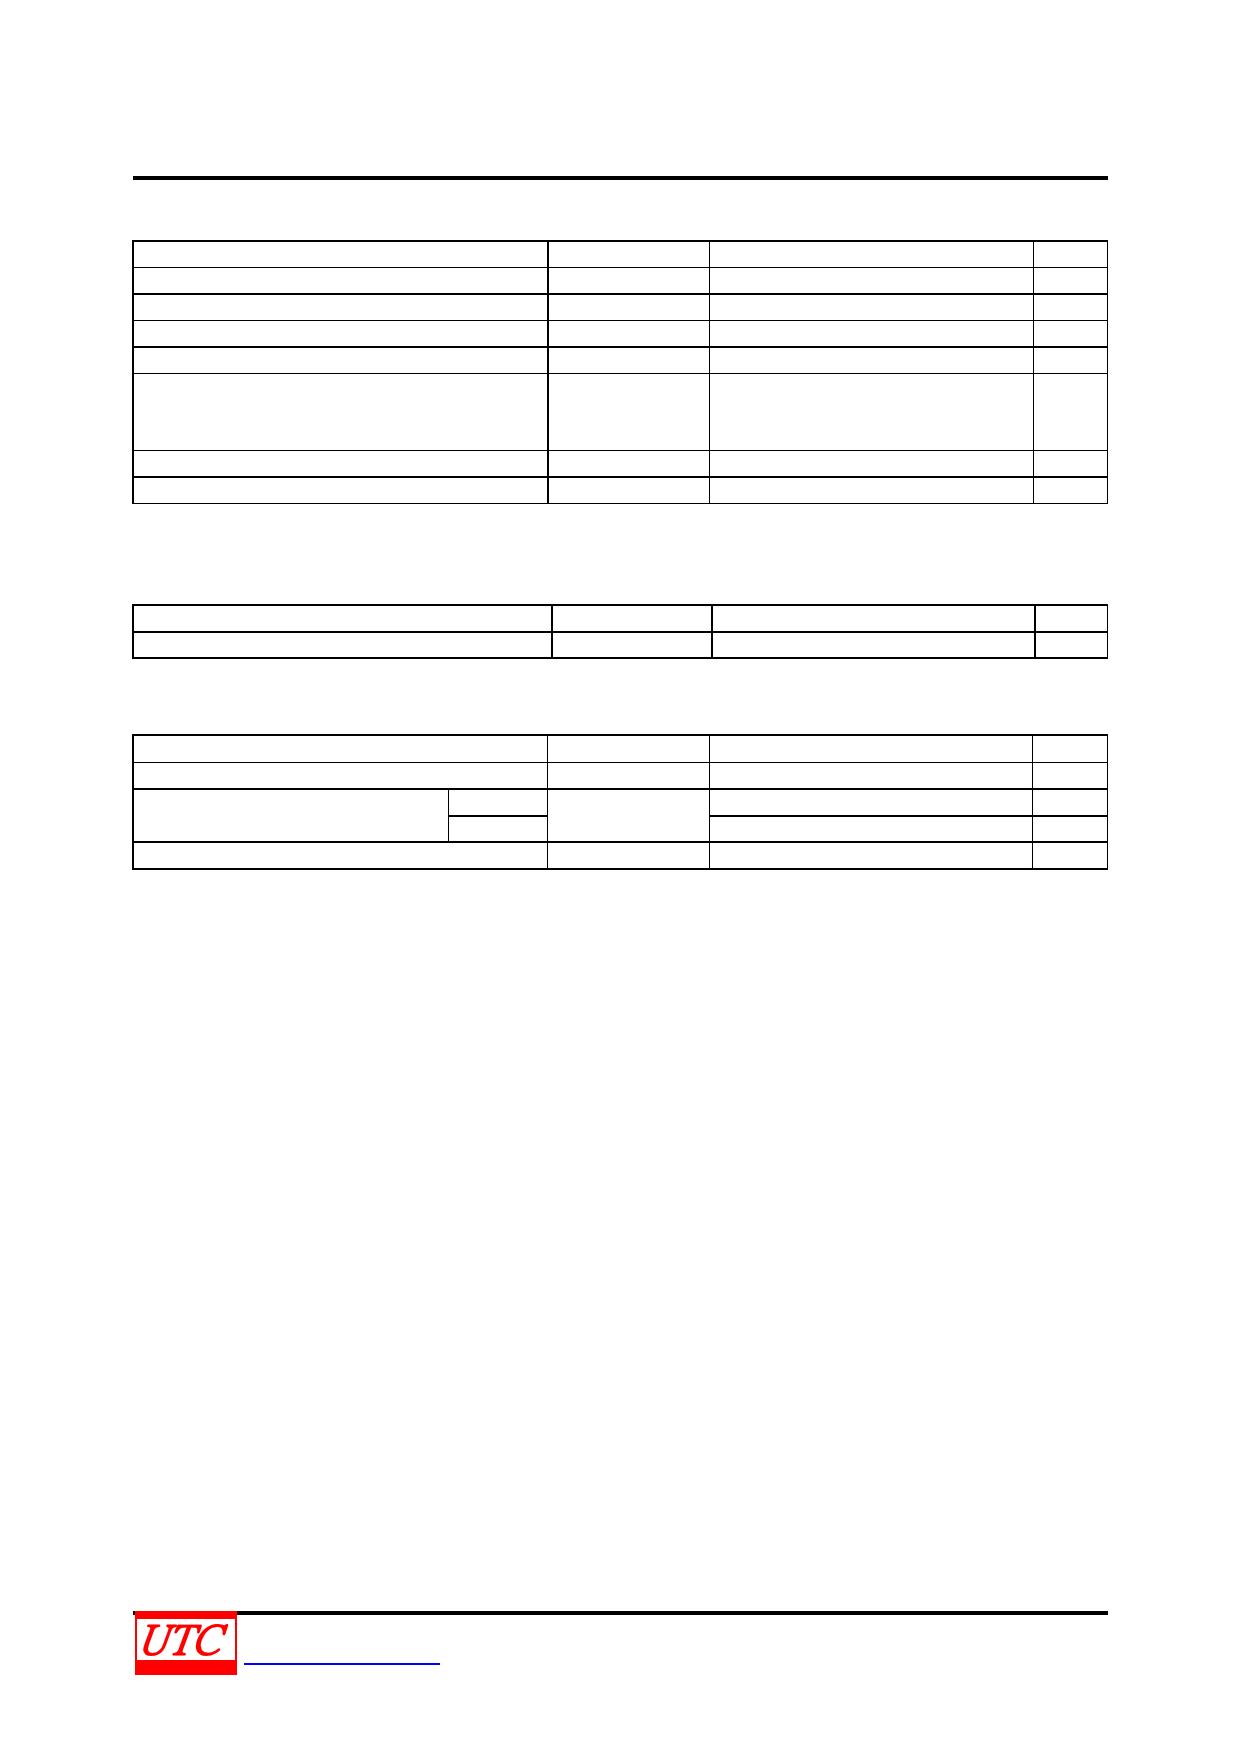 SK310 pdf, schematic